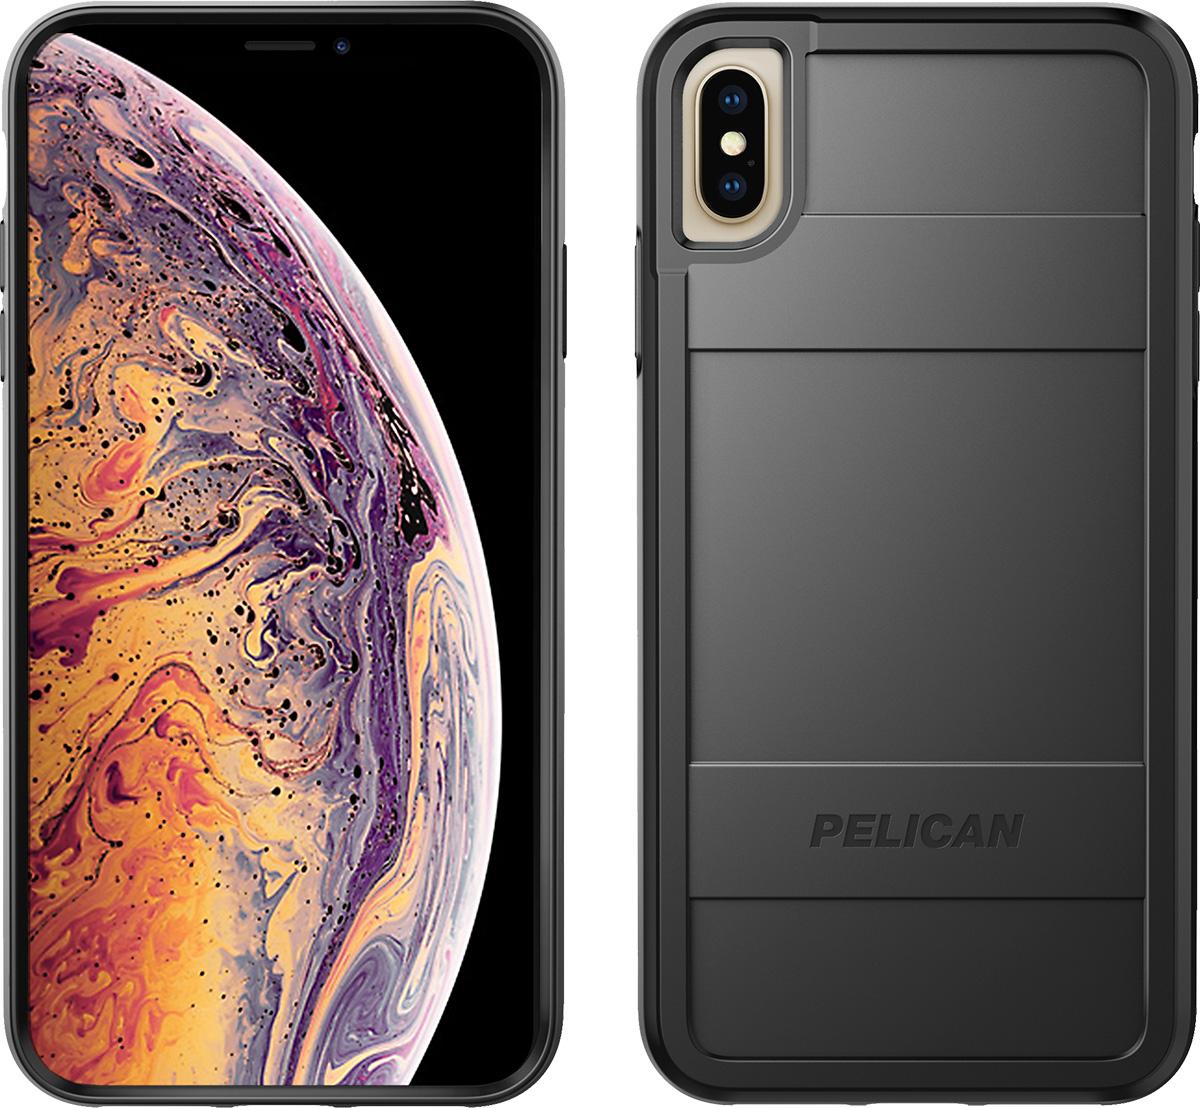 pelican apple iphone c43000 protector black phone case